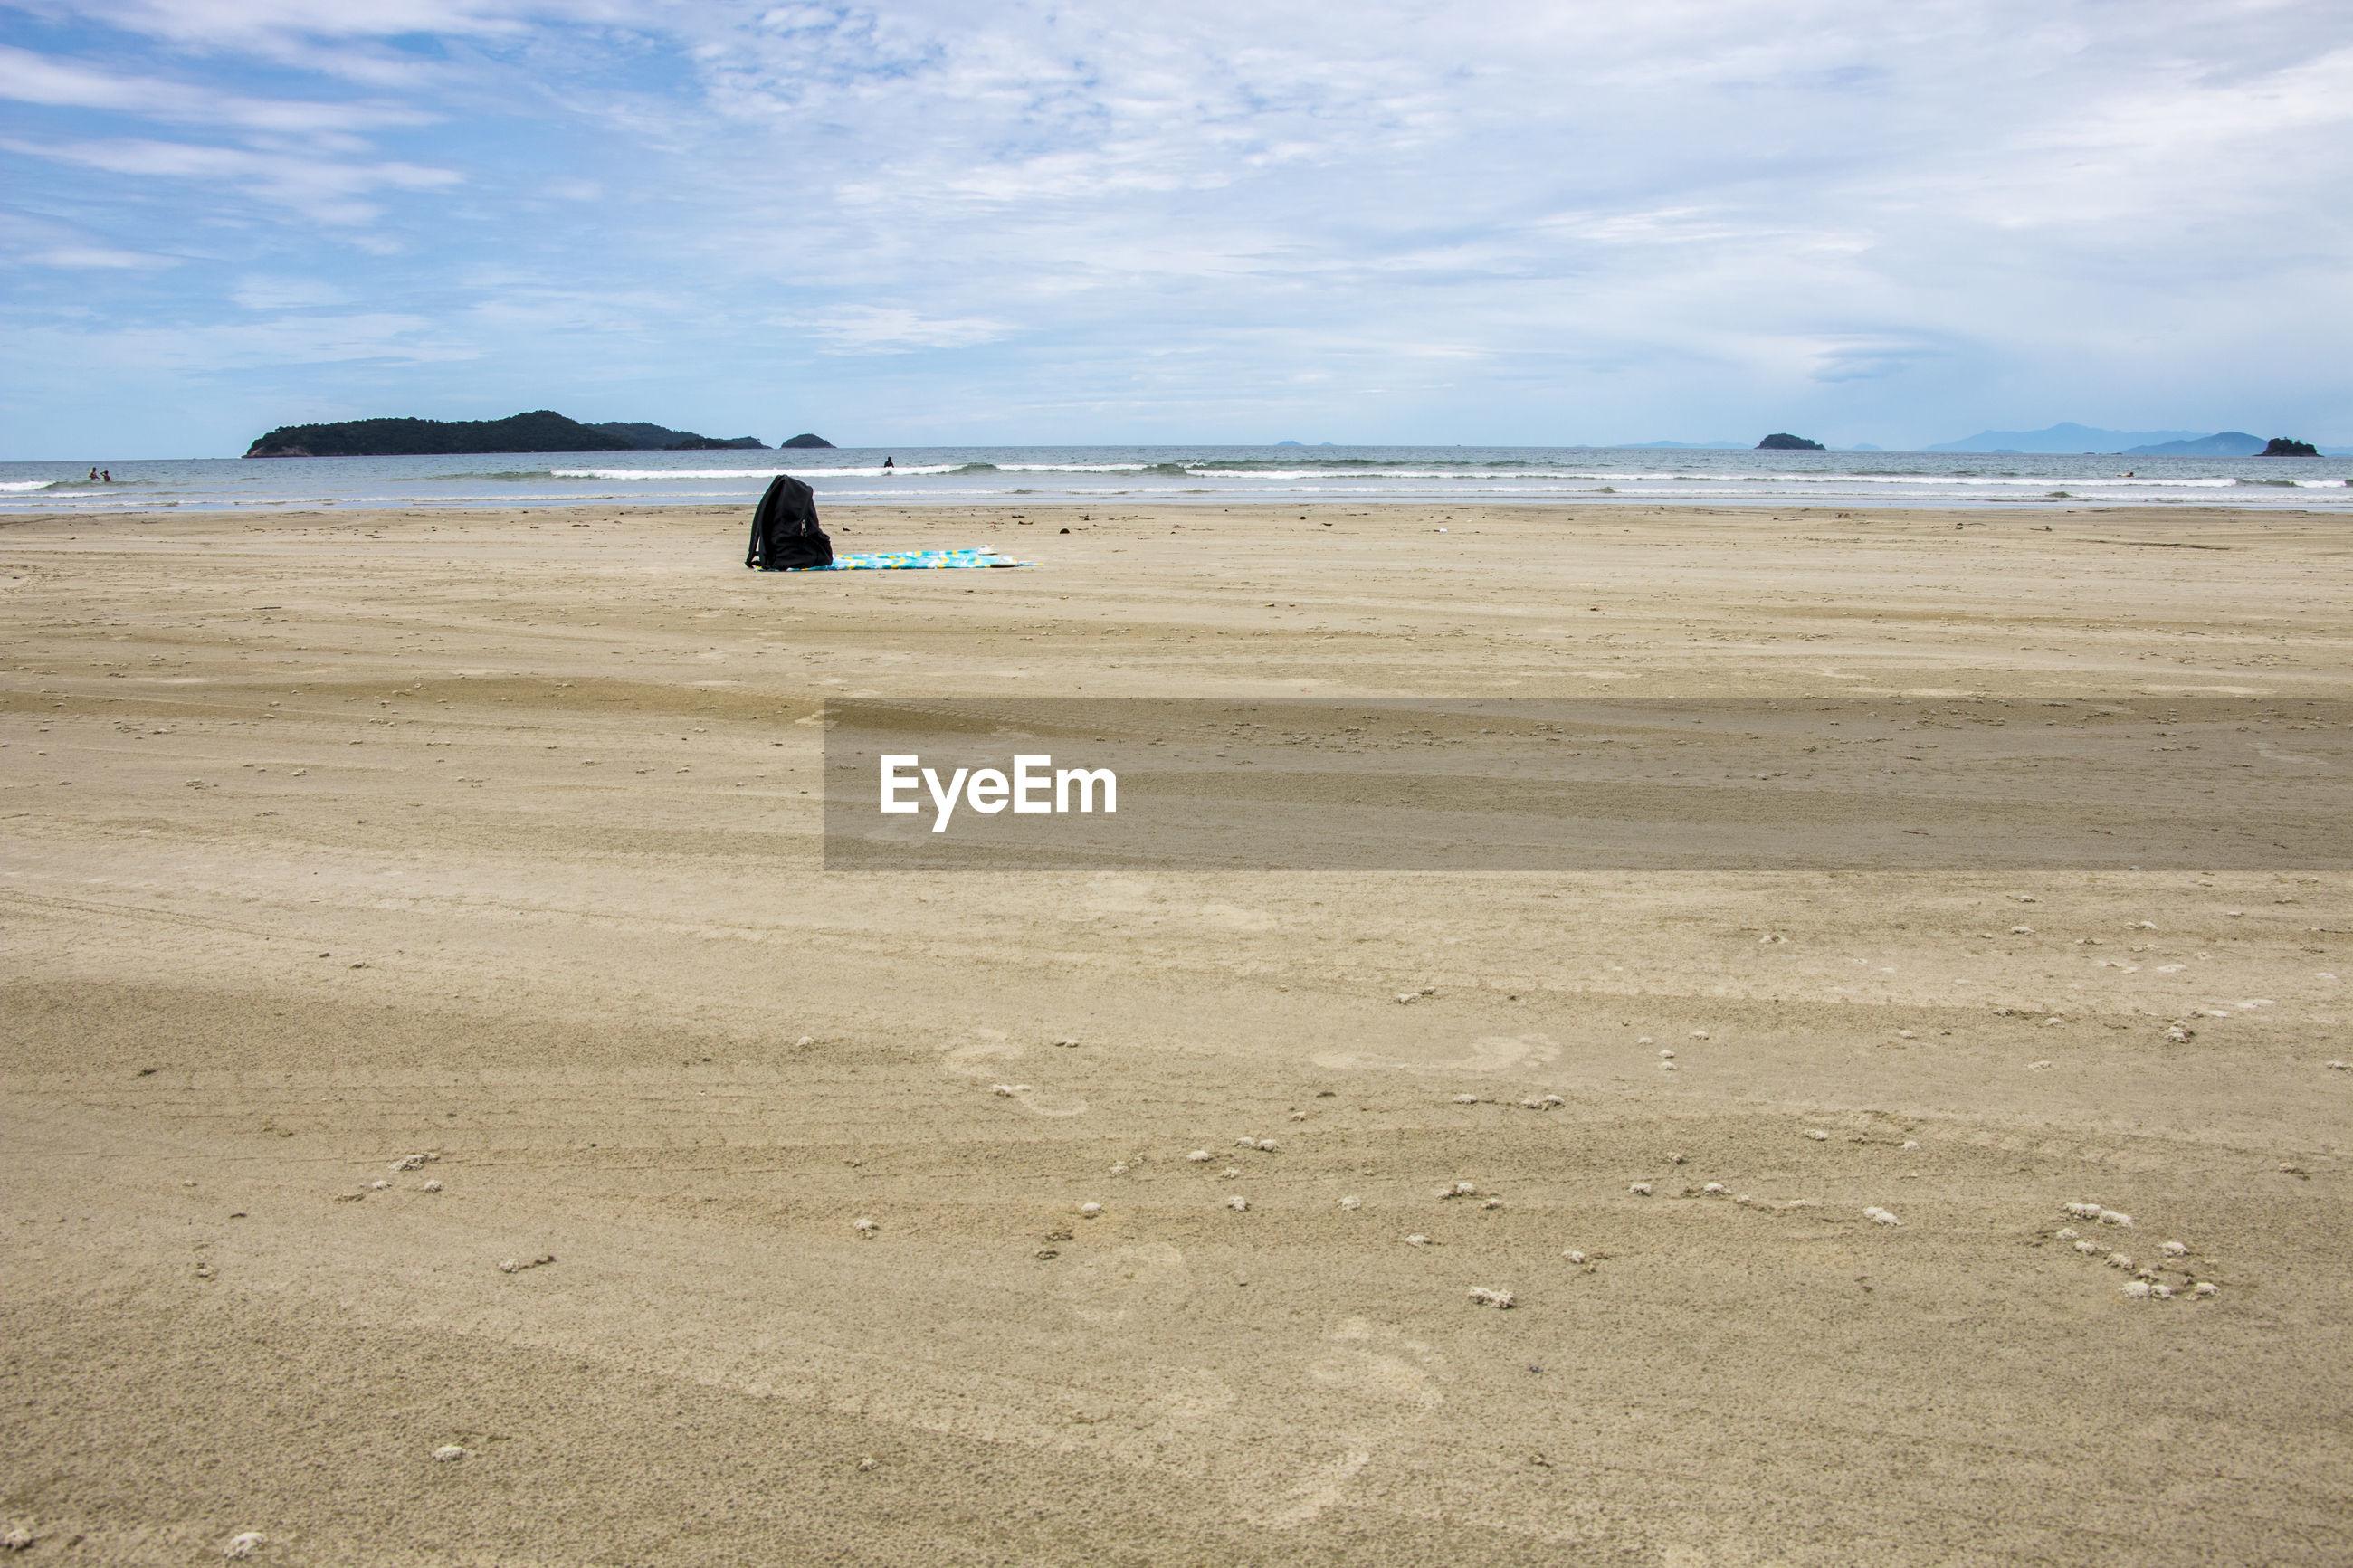 Abandoned bag on sand at beach against sky